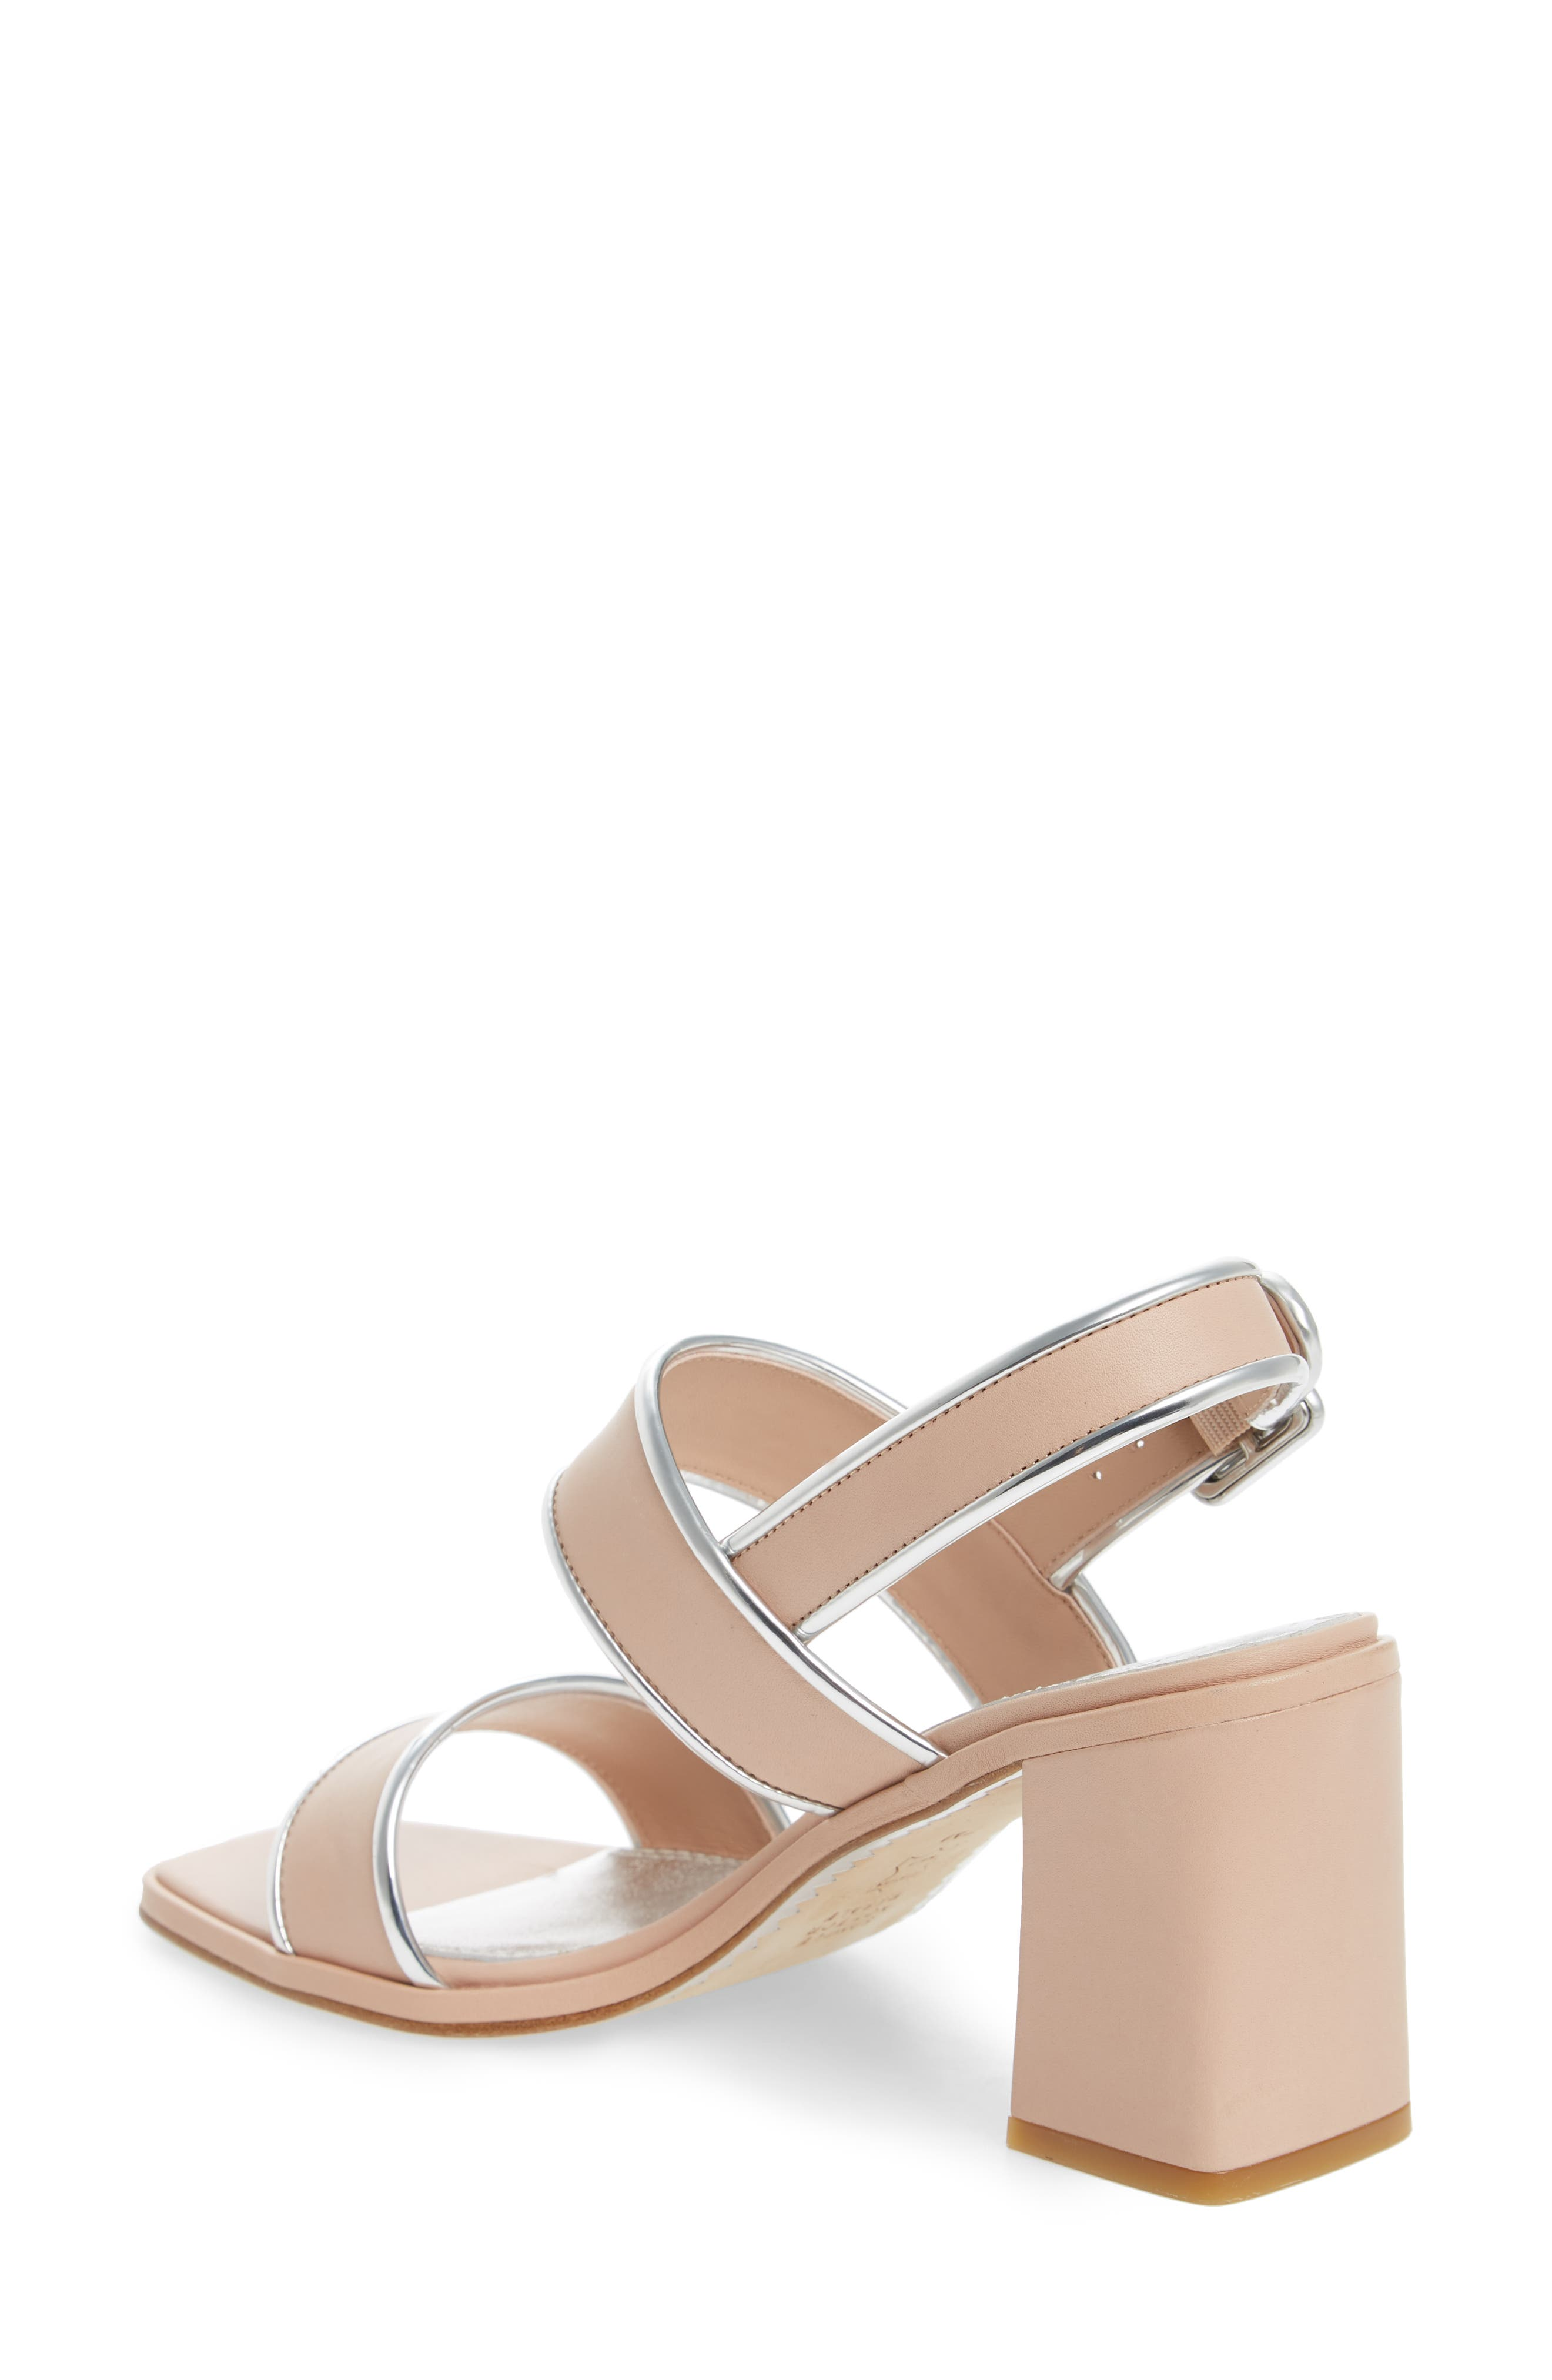 Delaney Double Strap Sandal,                             Alternate thumbnail 2, color,                             Goan Sand/ Silver